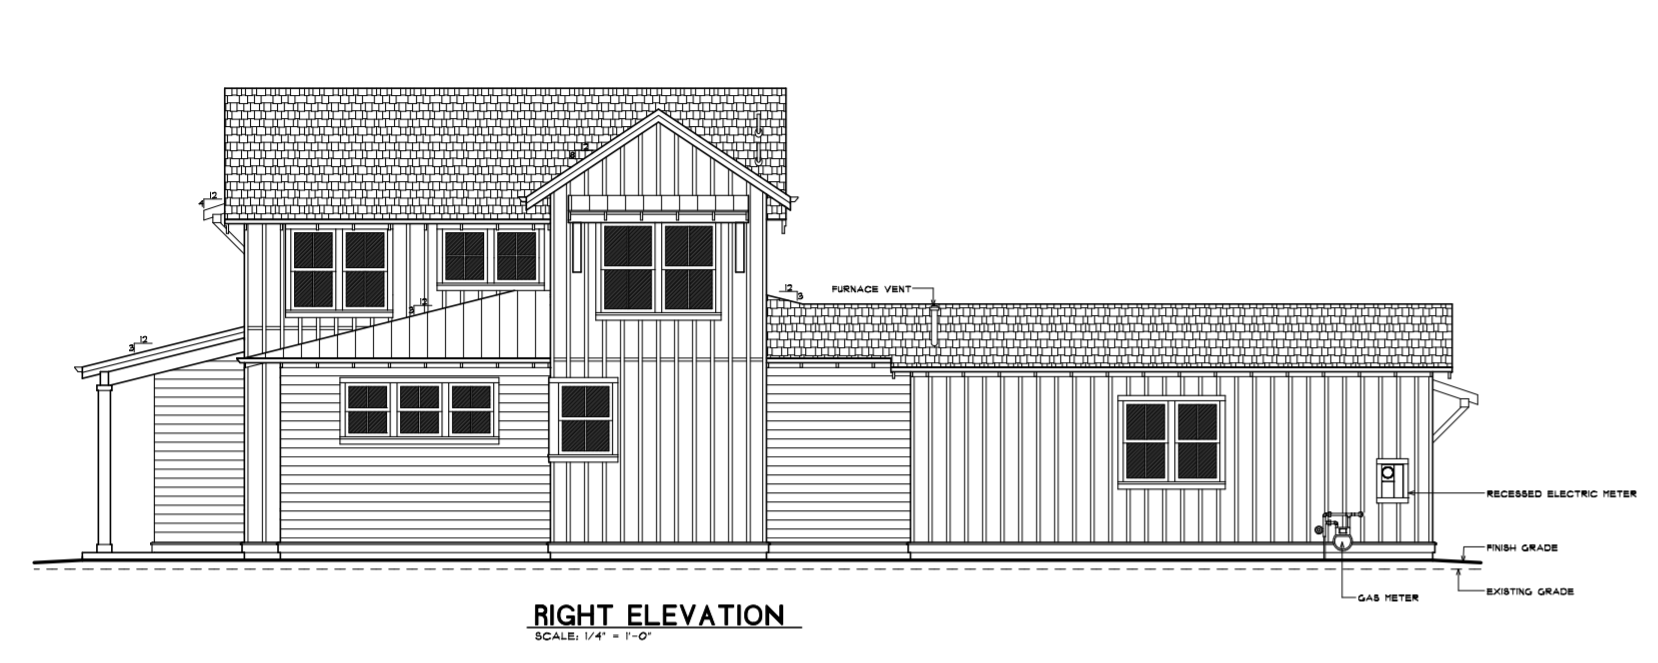 Right-Elevation